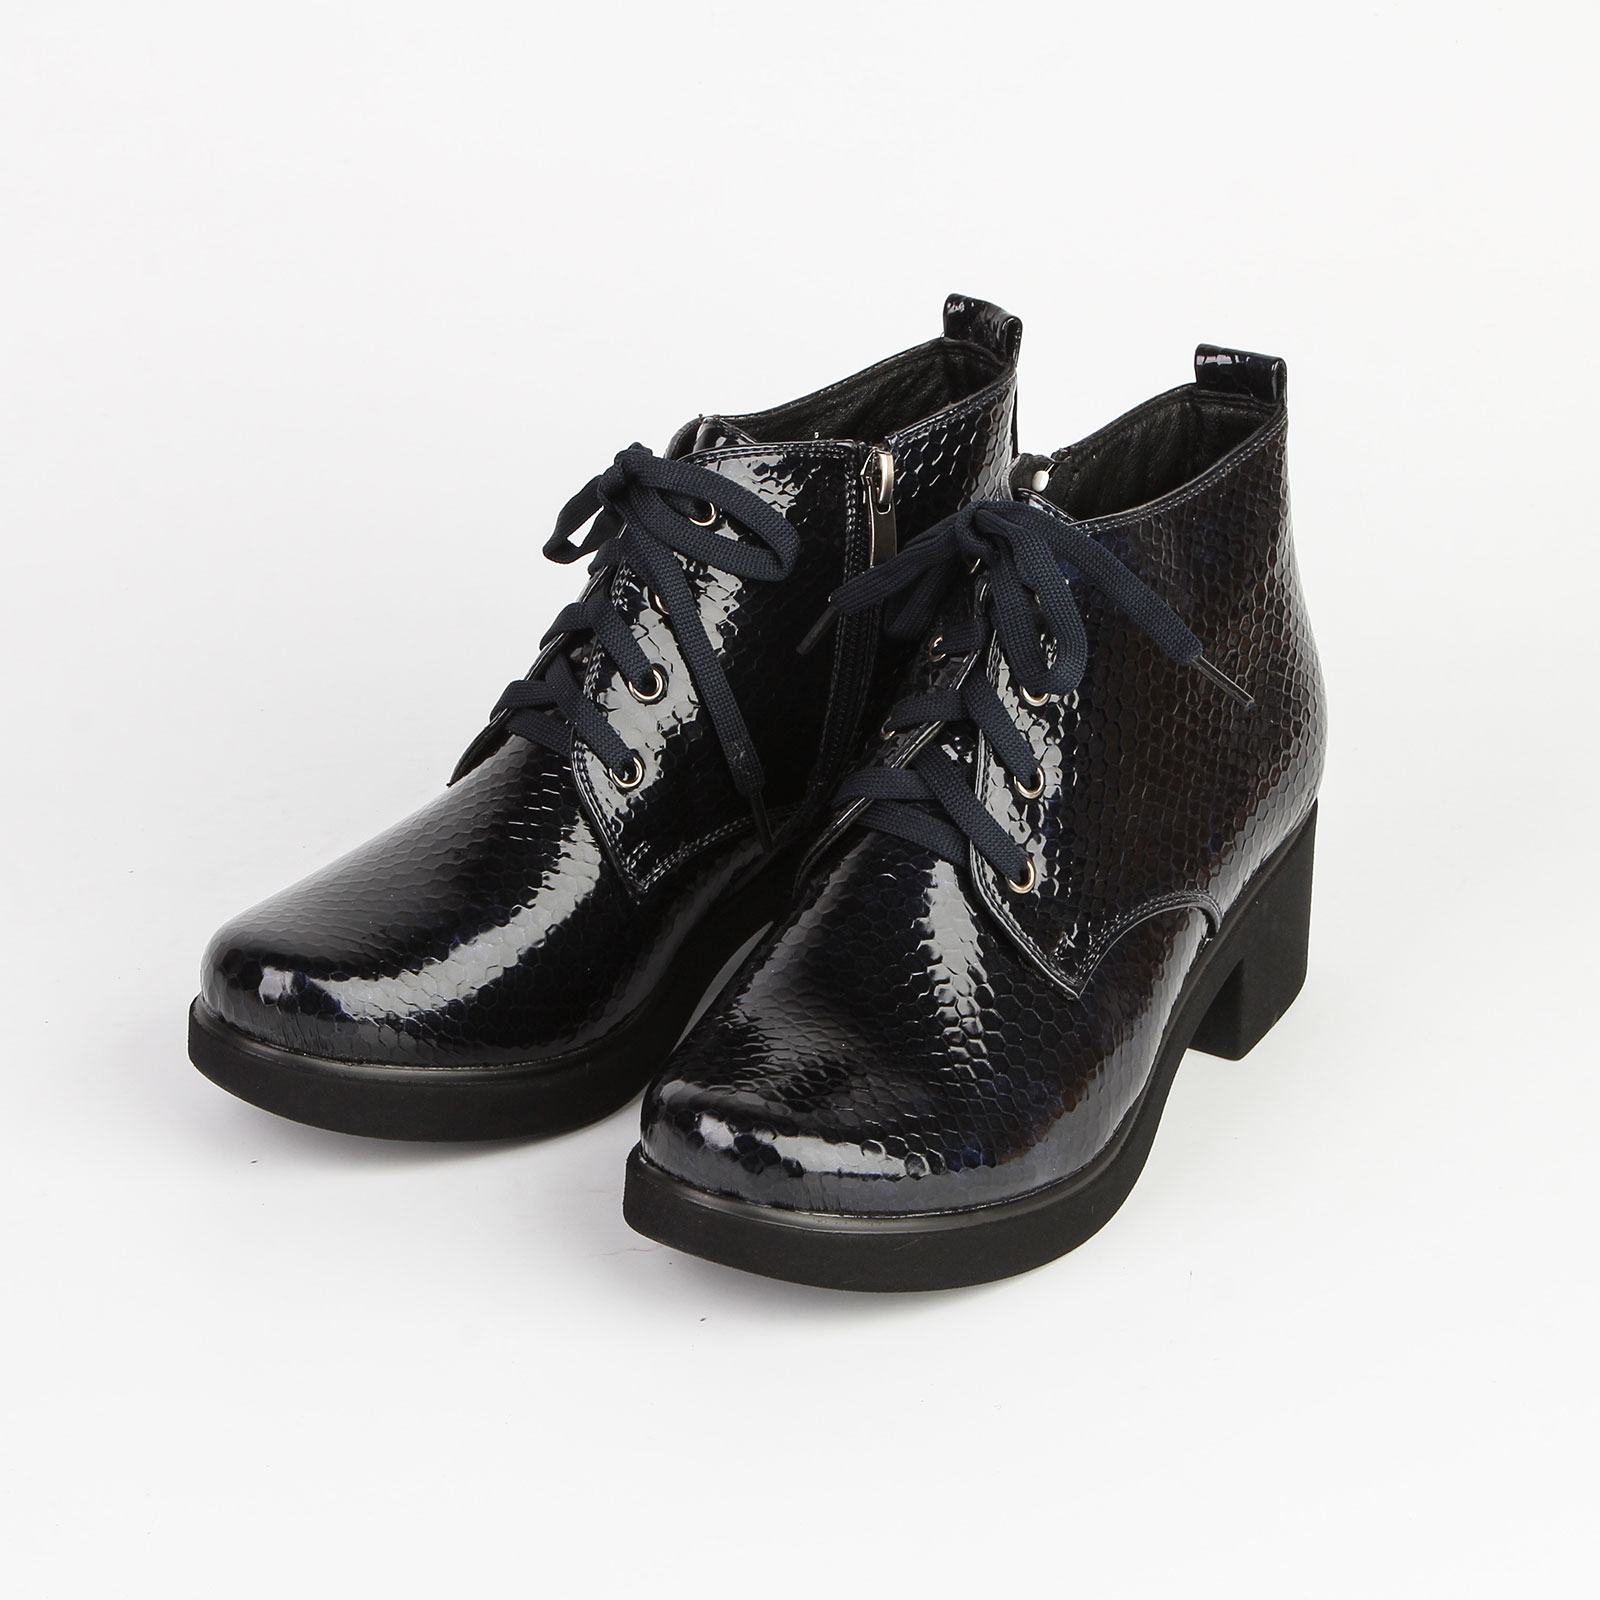 Ботинки женские рептилия на шнуровке